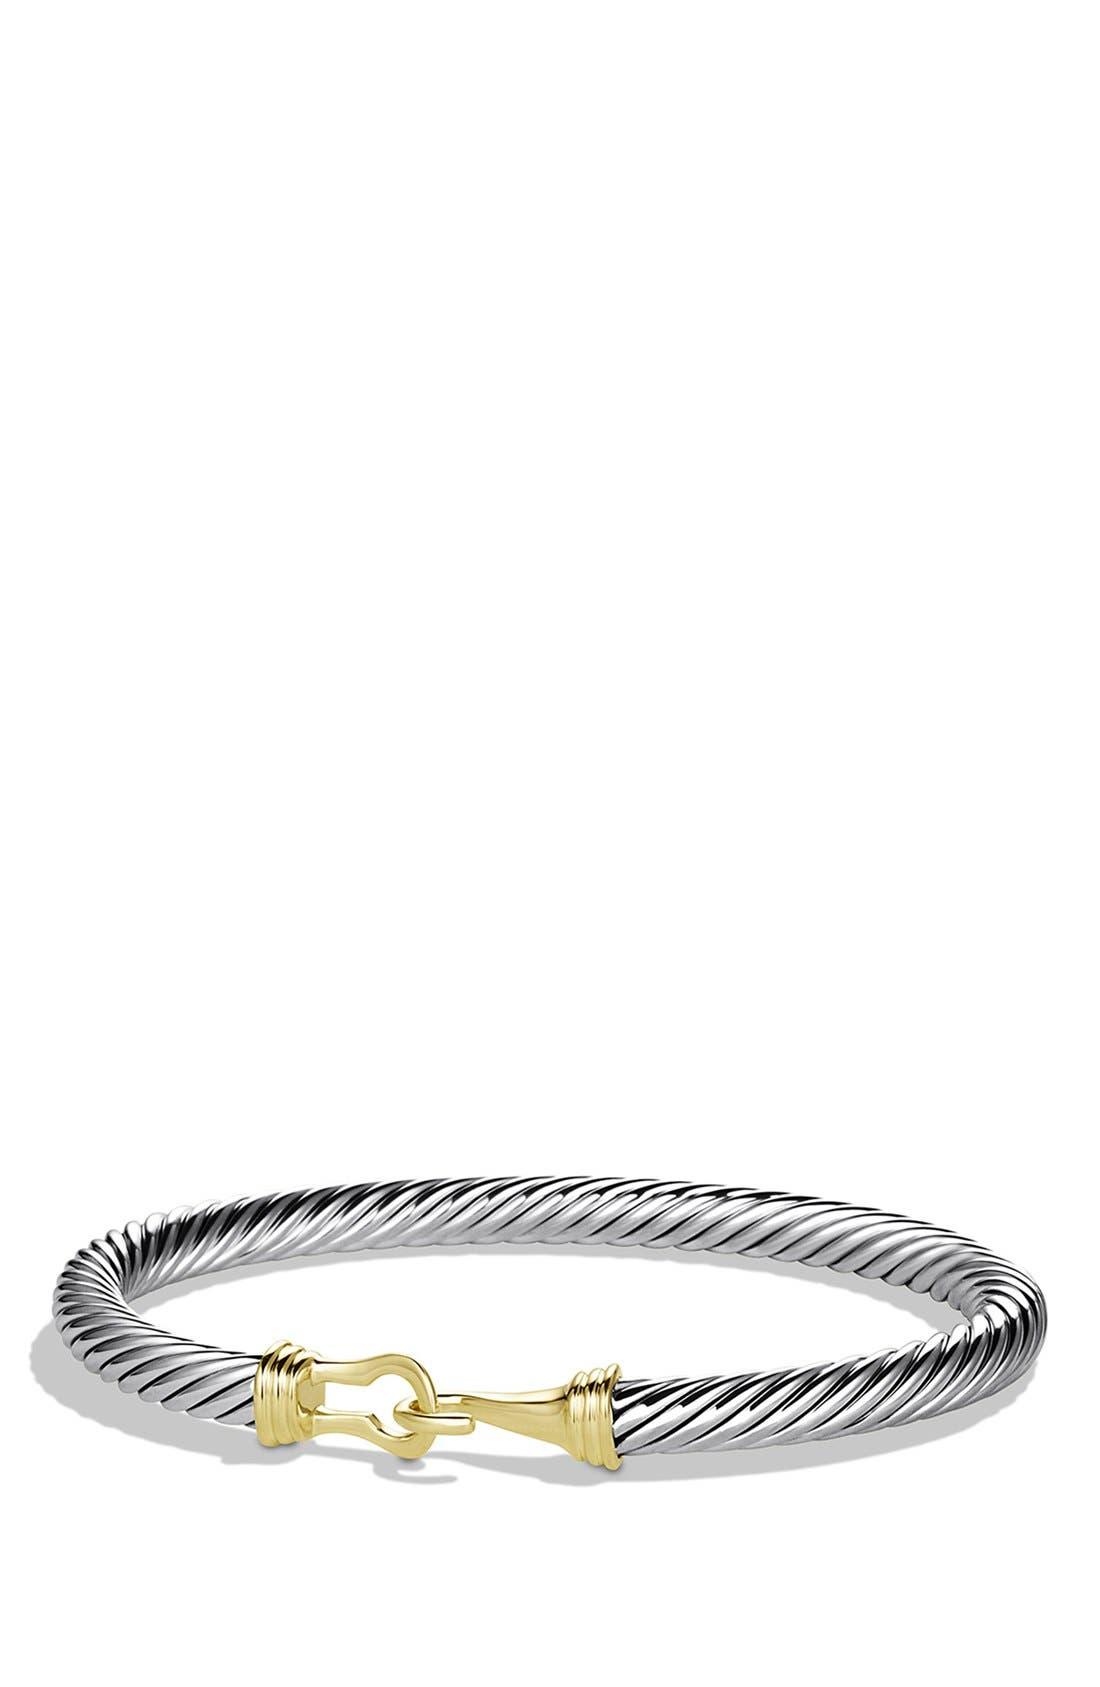 david yurman u0027cable buckleu0027 bracelet with gold